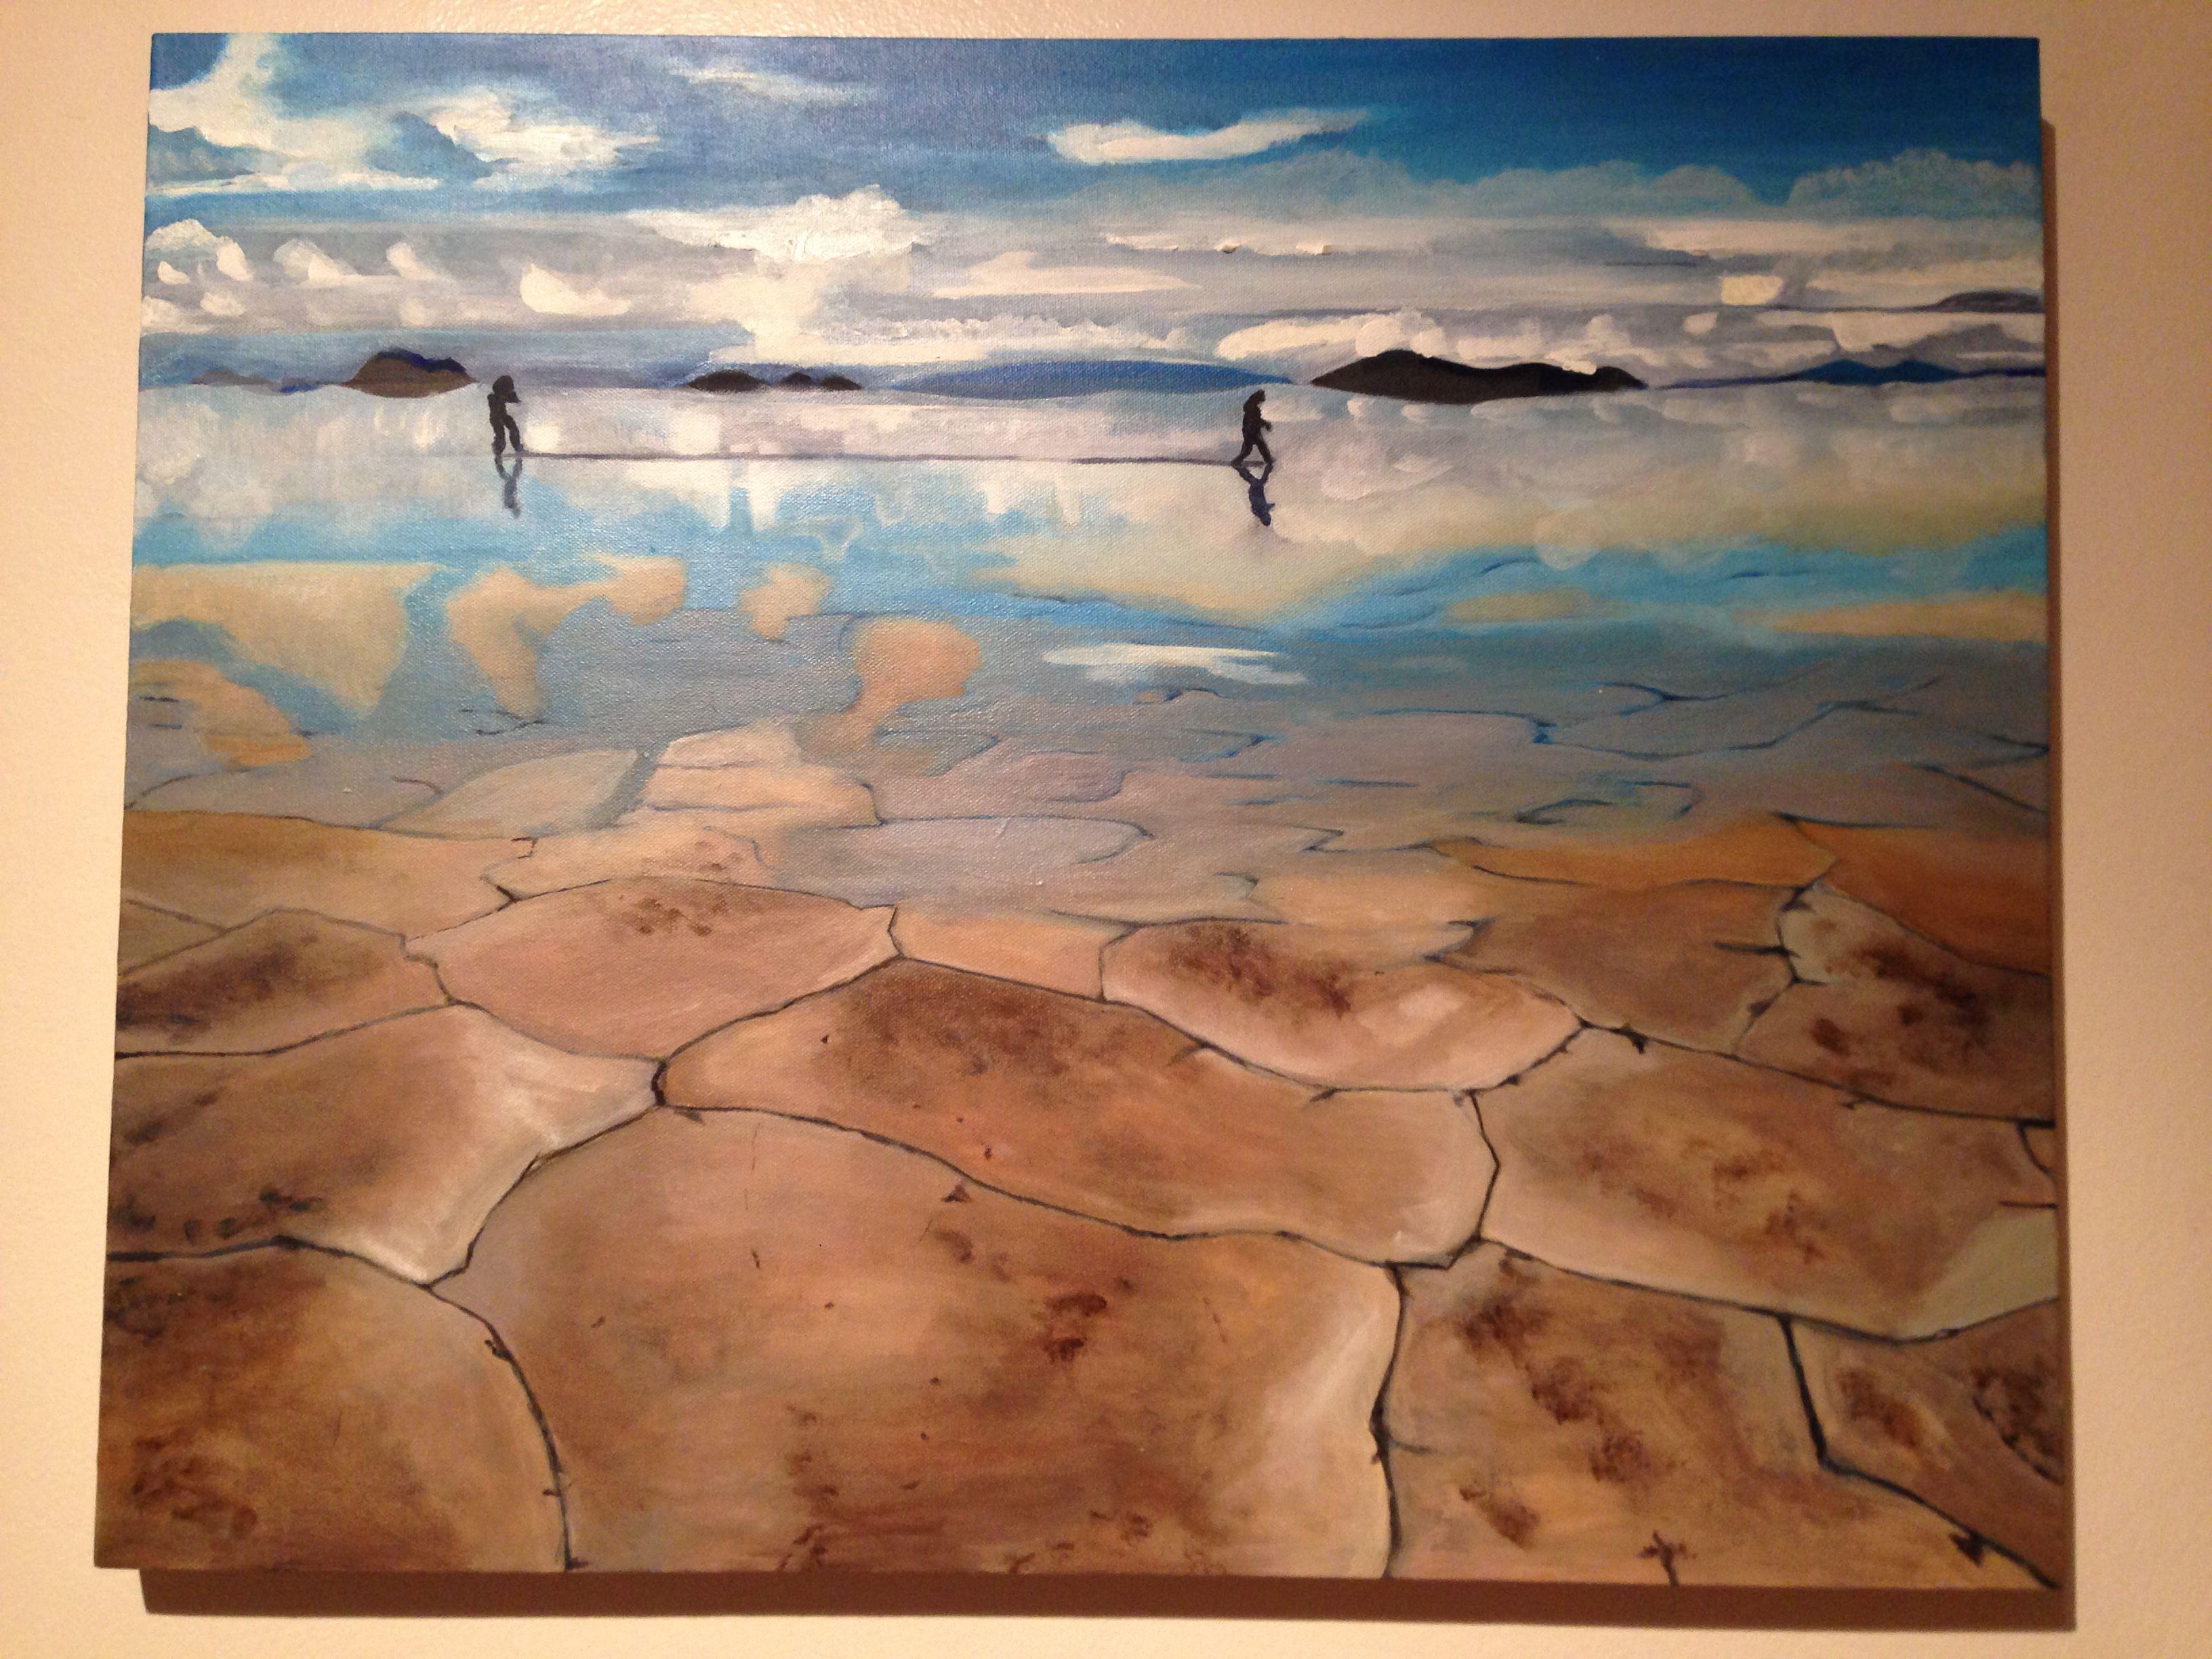 Salt lake, Bolivia by Charmaine Lim (acrylic on canvas)